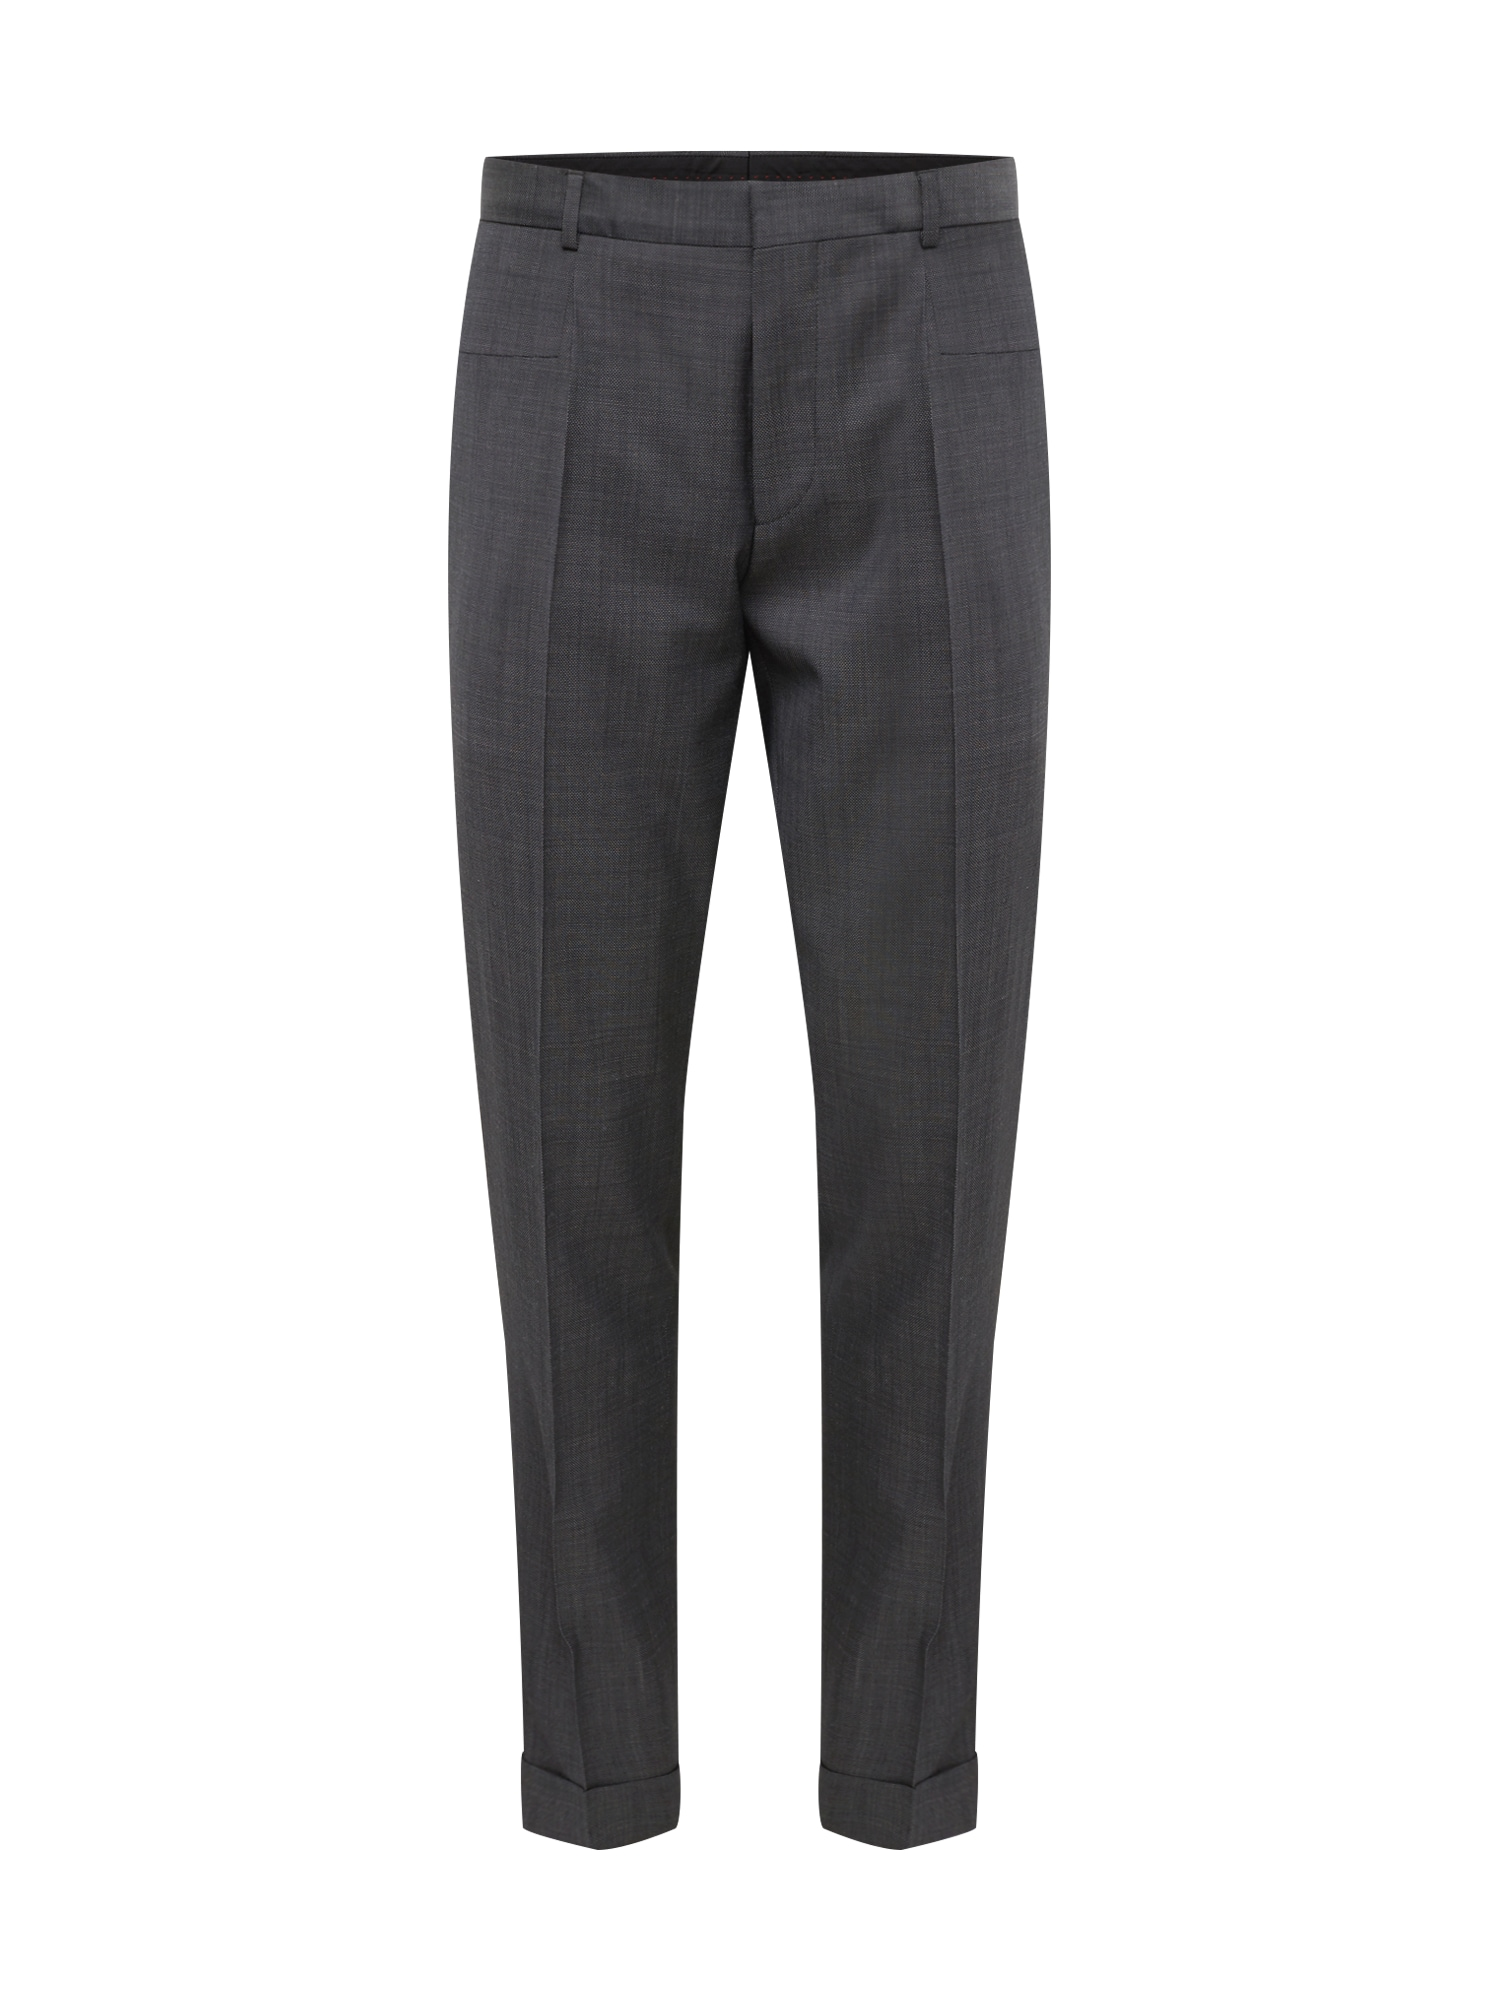 Kalhoty s puky Gabriel193F1 tmavě šedá HUGO